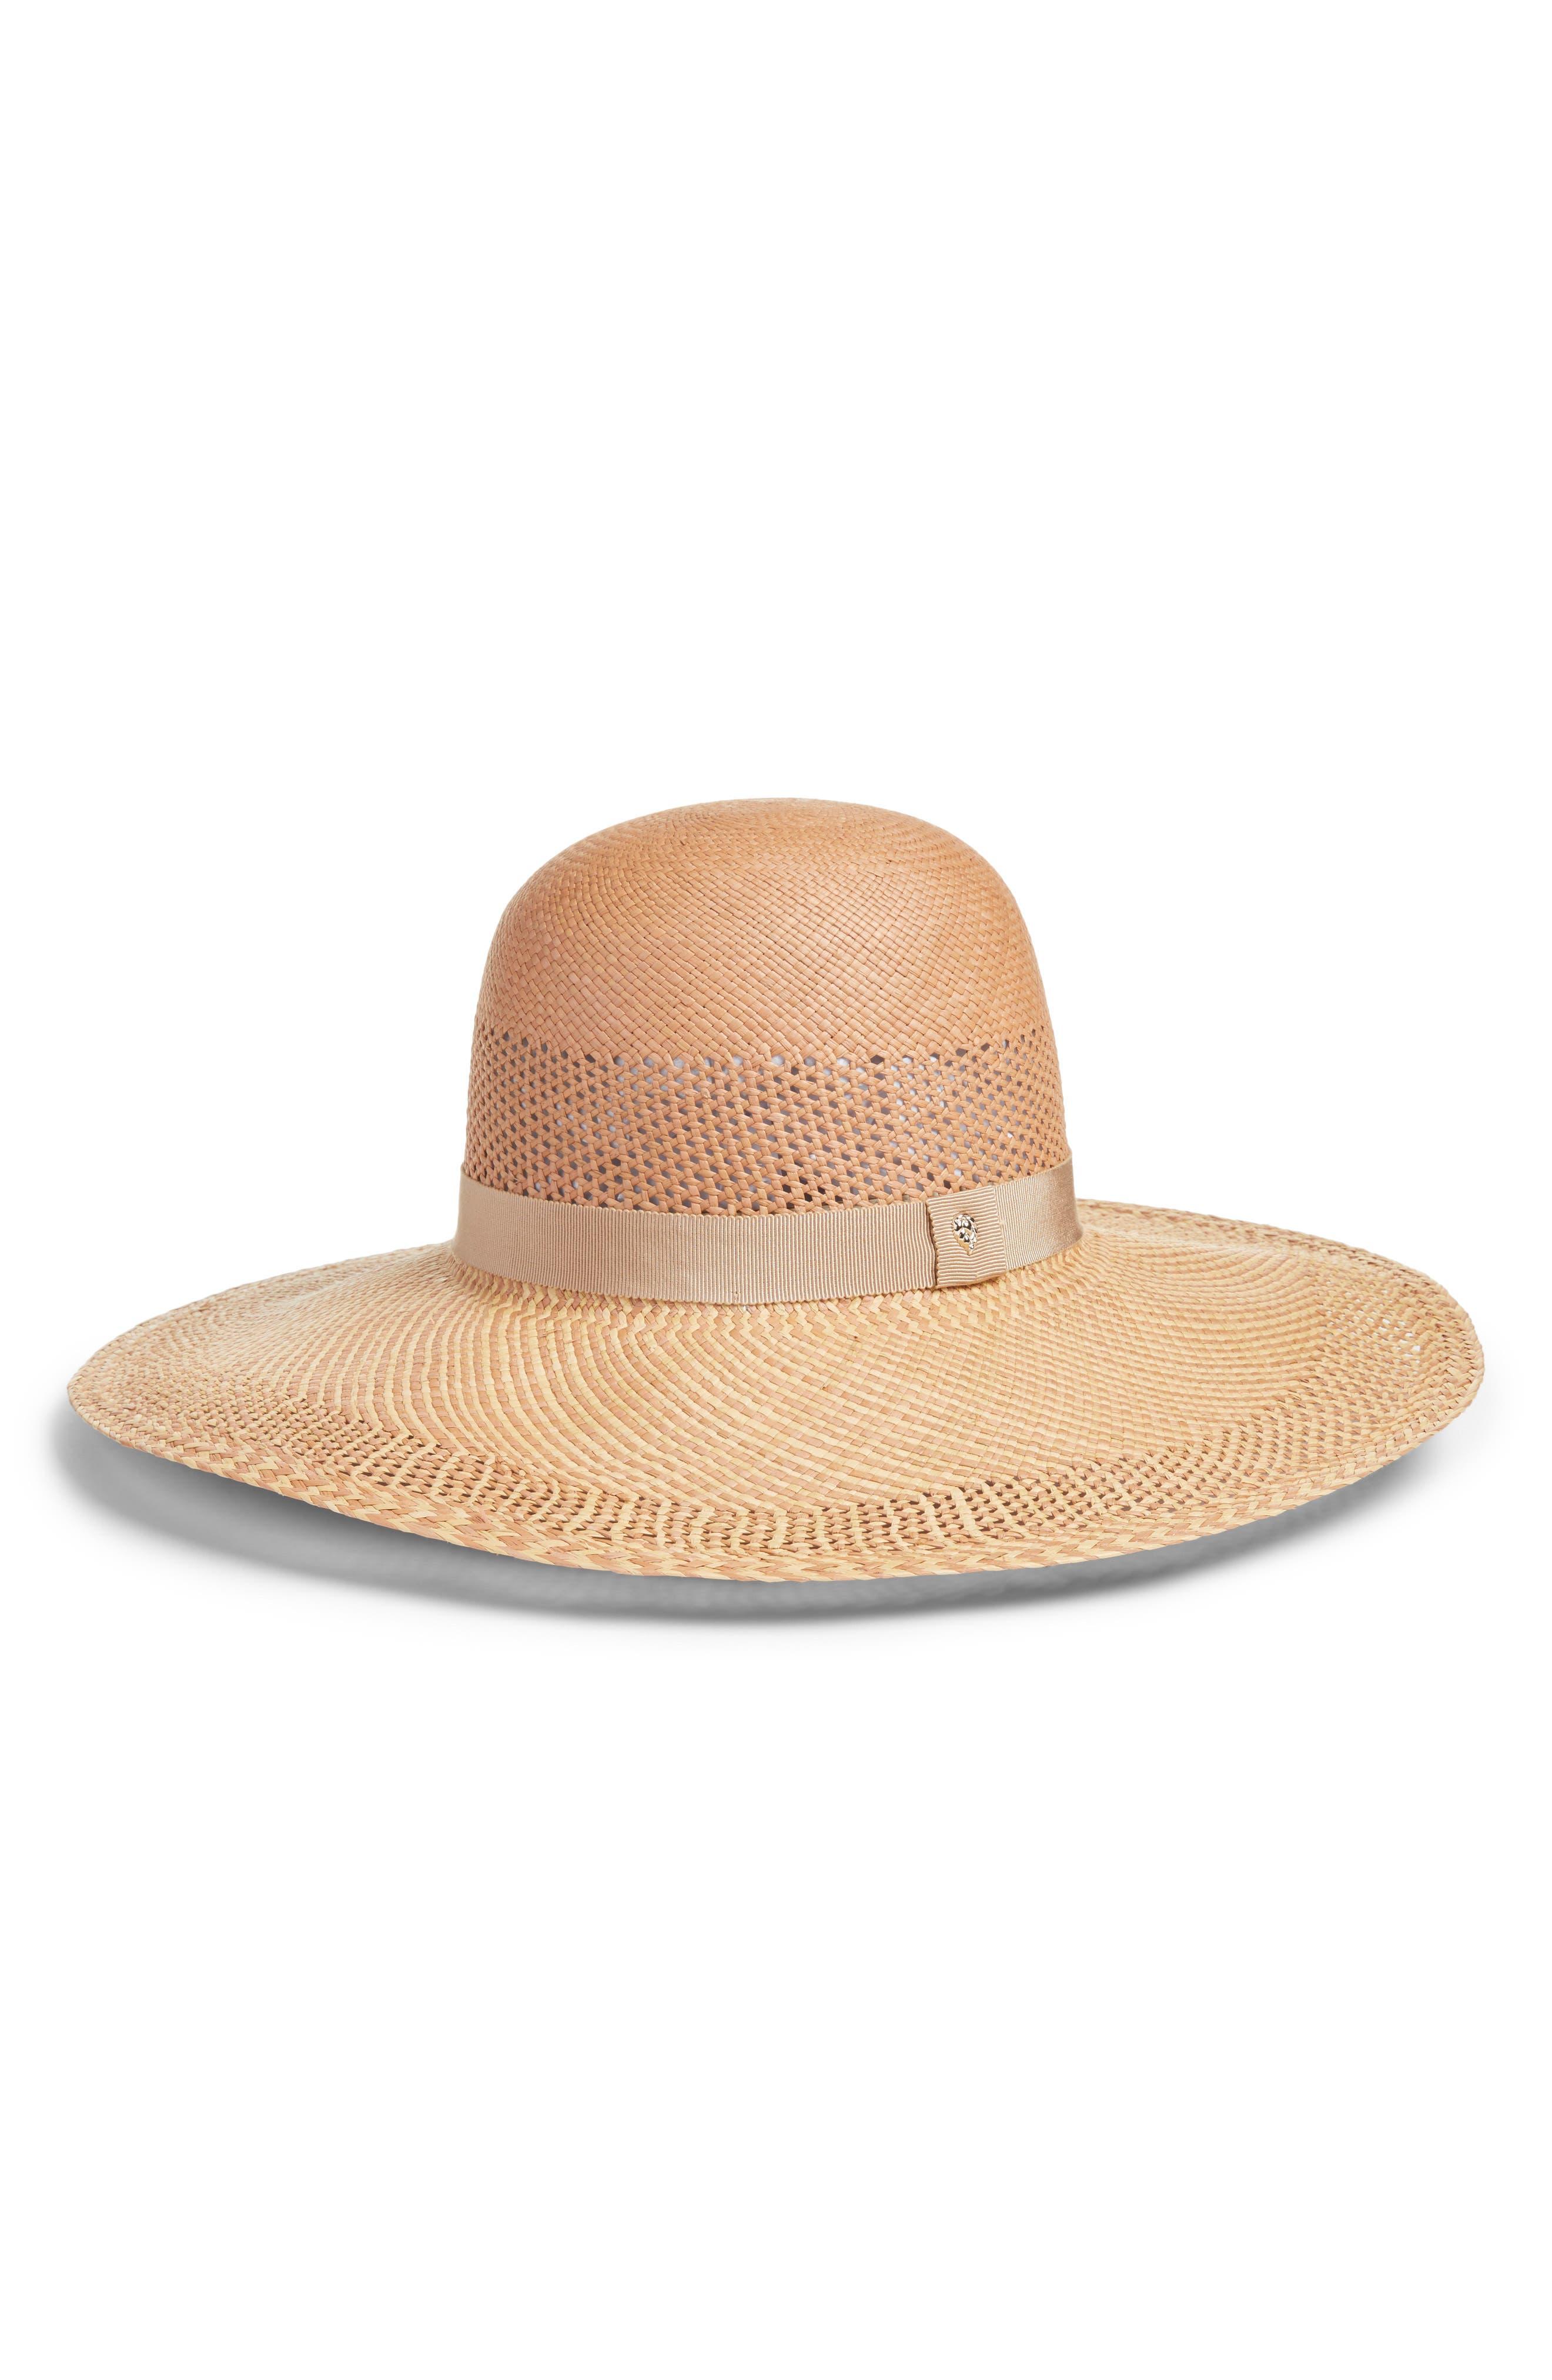 Azuay Palm Sun Hat,                         Main,                         color,